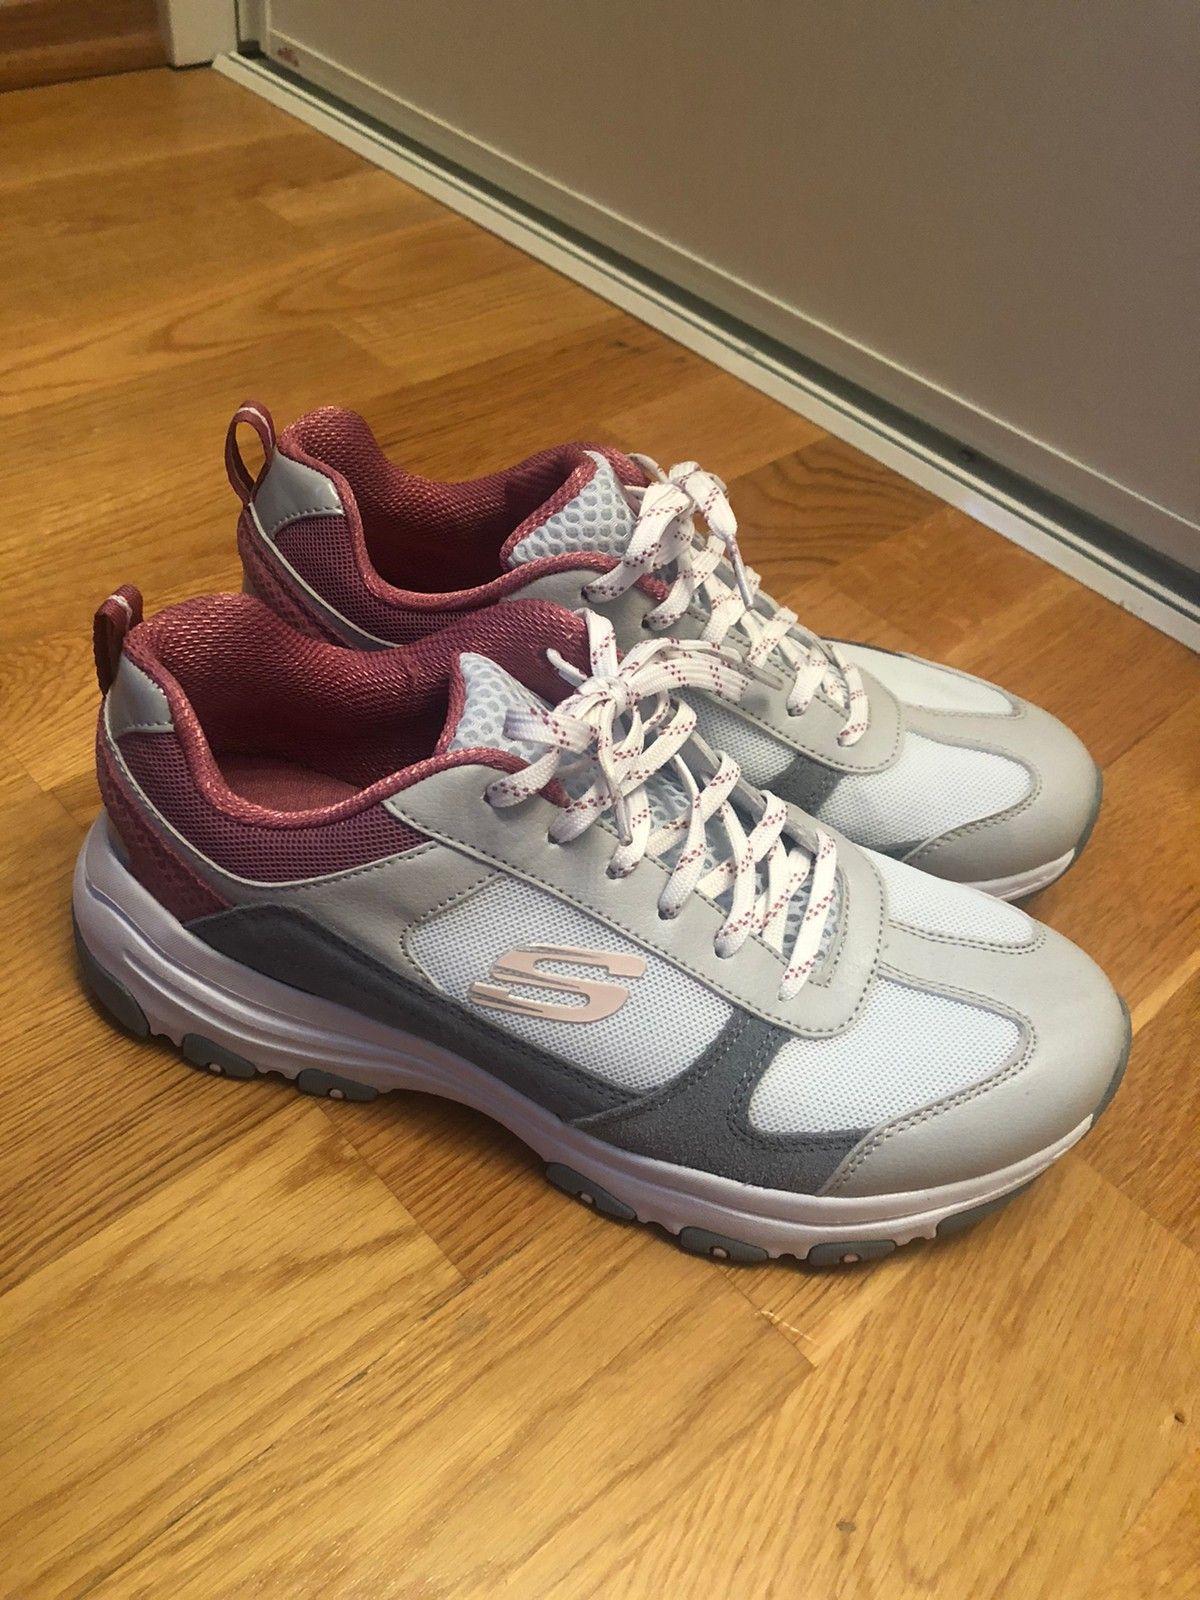 Skechers sko selges | FINN.no